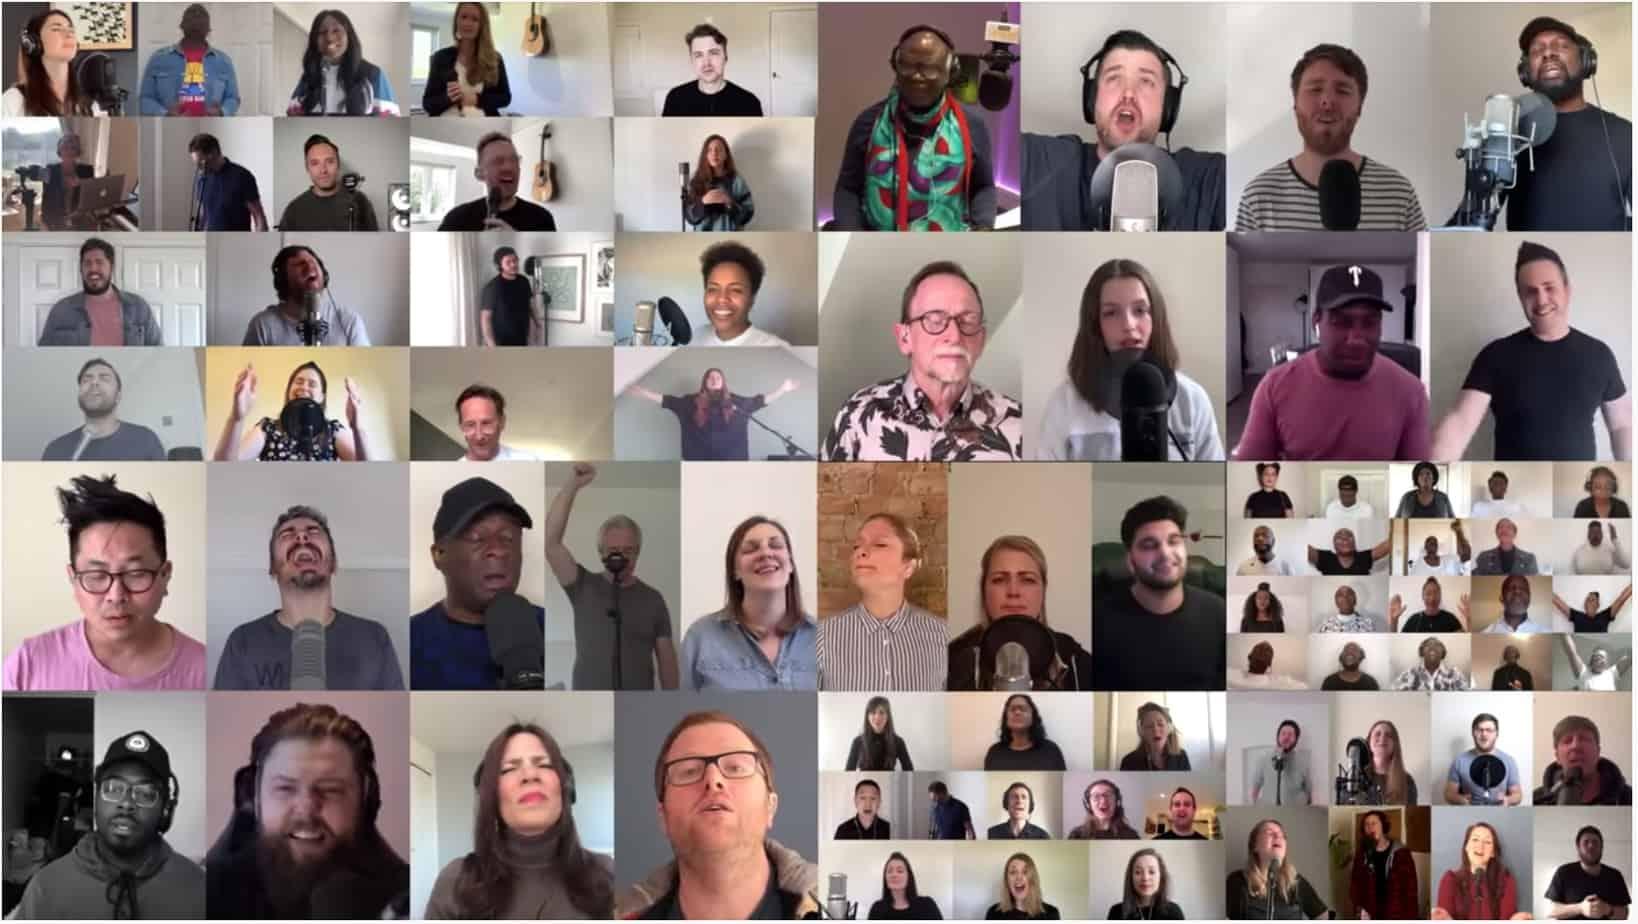 The UK Blessing heads towards 4 million views bringing hope worldwide